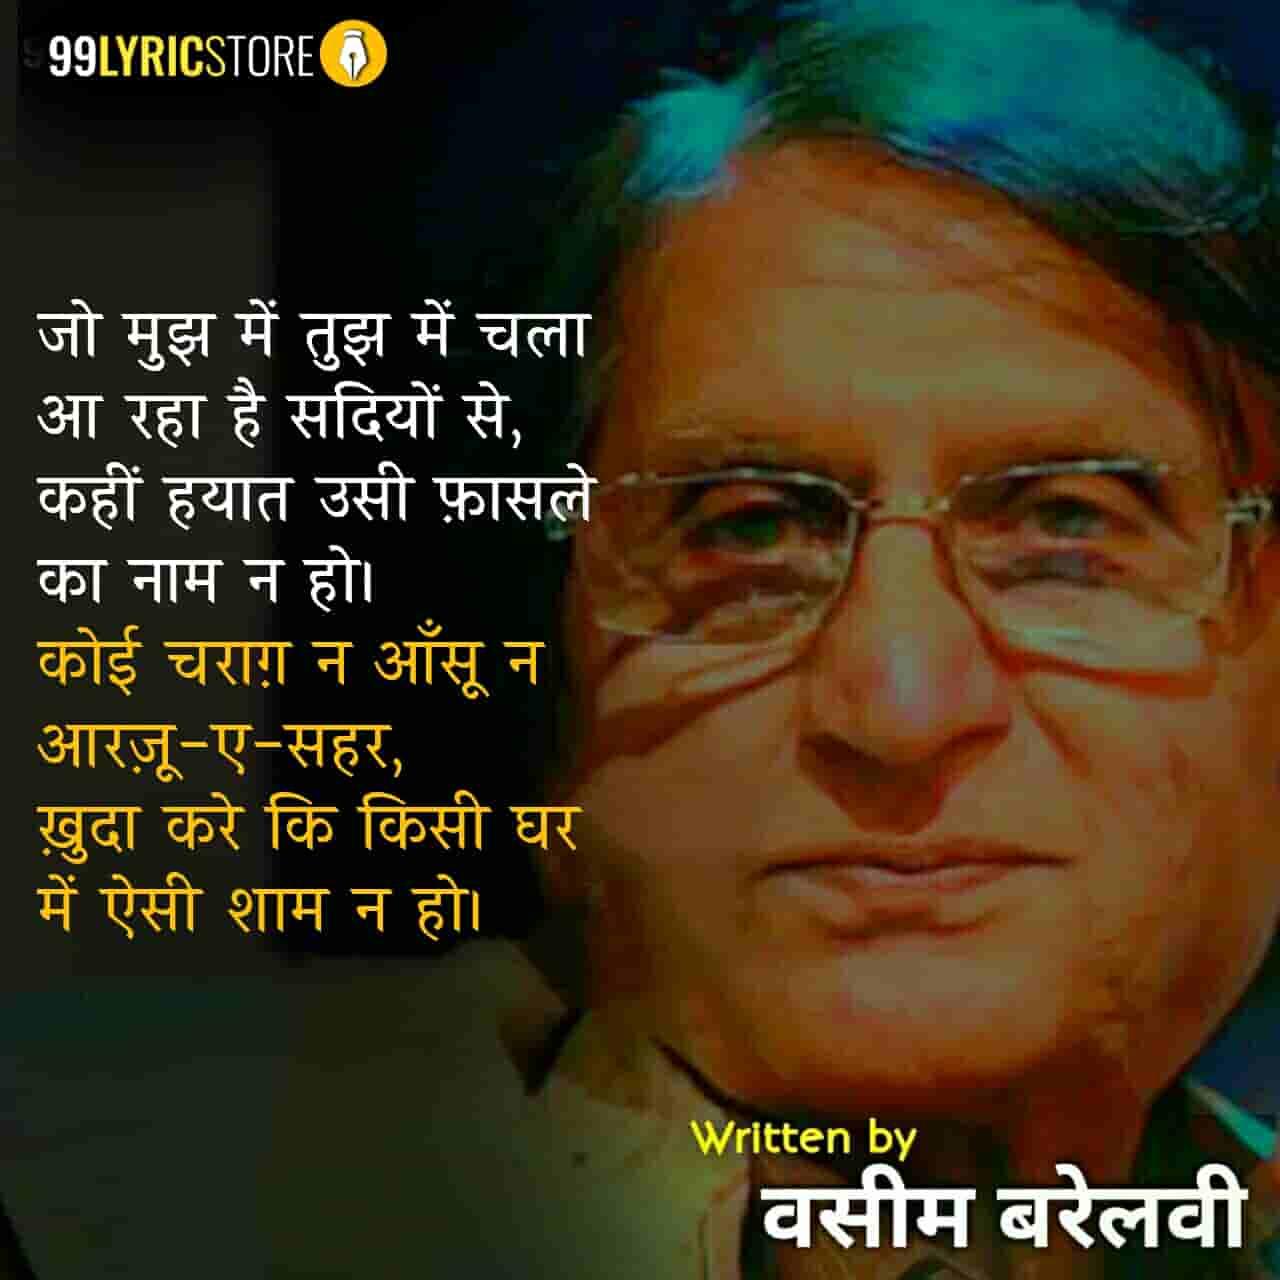 This beautiful ghazal Dua Karo Ki Koi Pyaas has written by Waseem Barelvi.